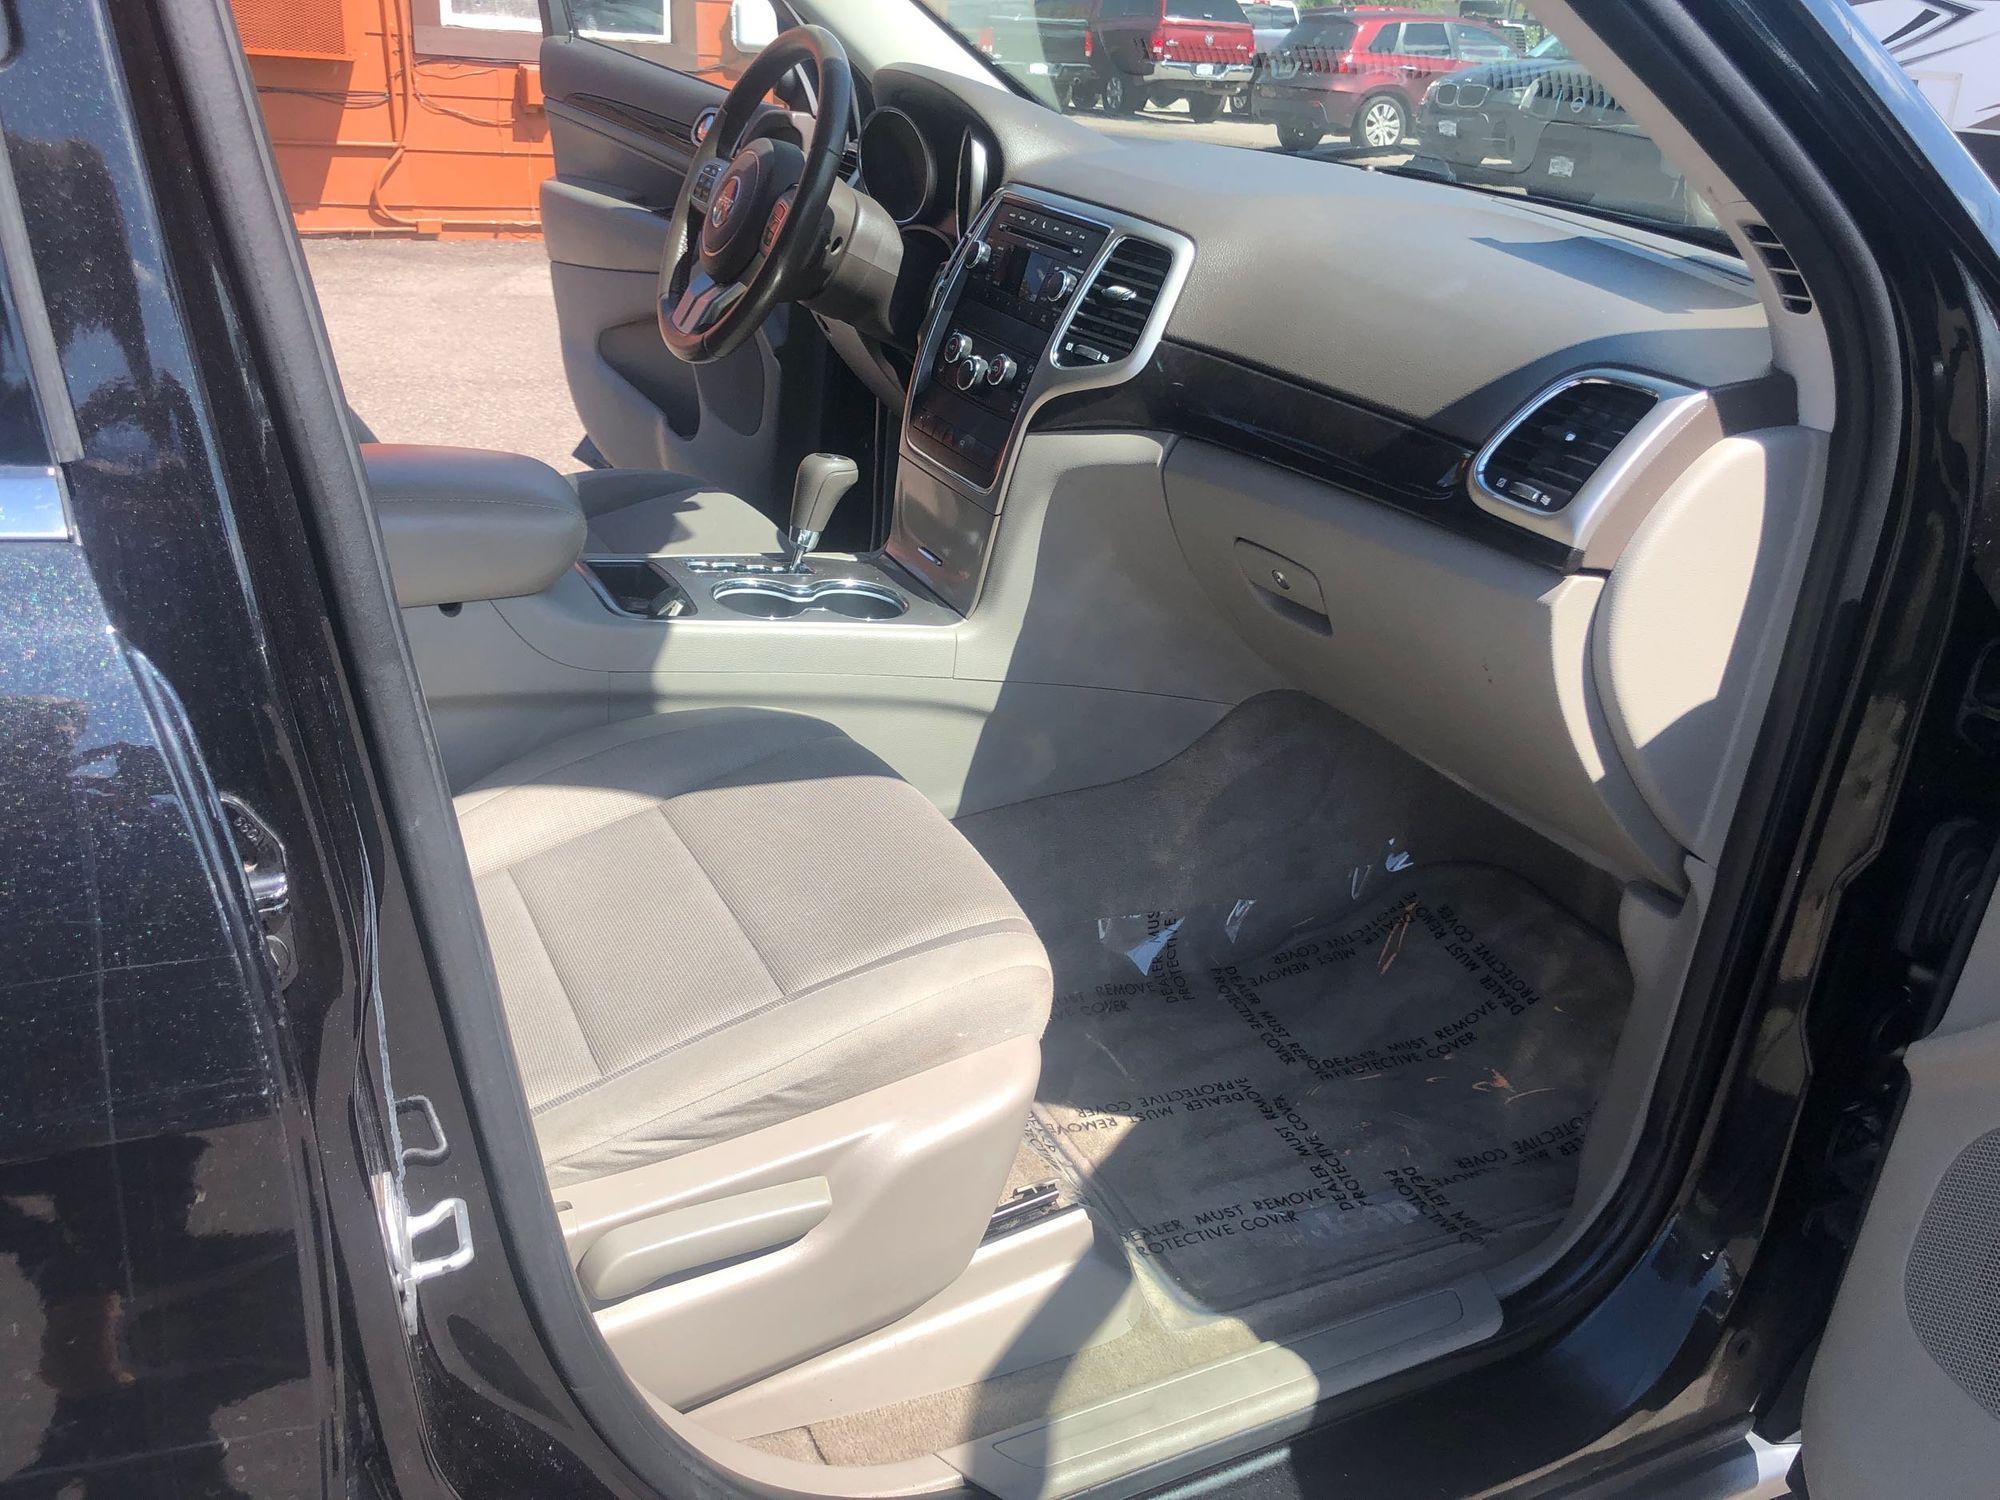 2011 Jeep Grand Cherokee Laredo   Berkenkotter Motors